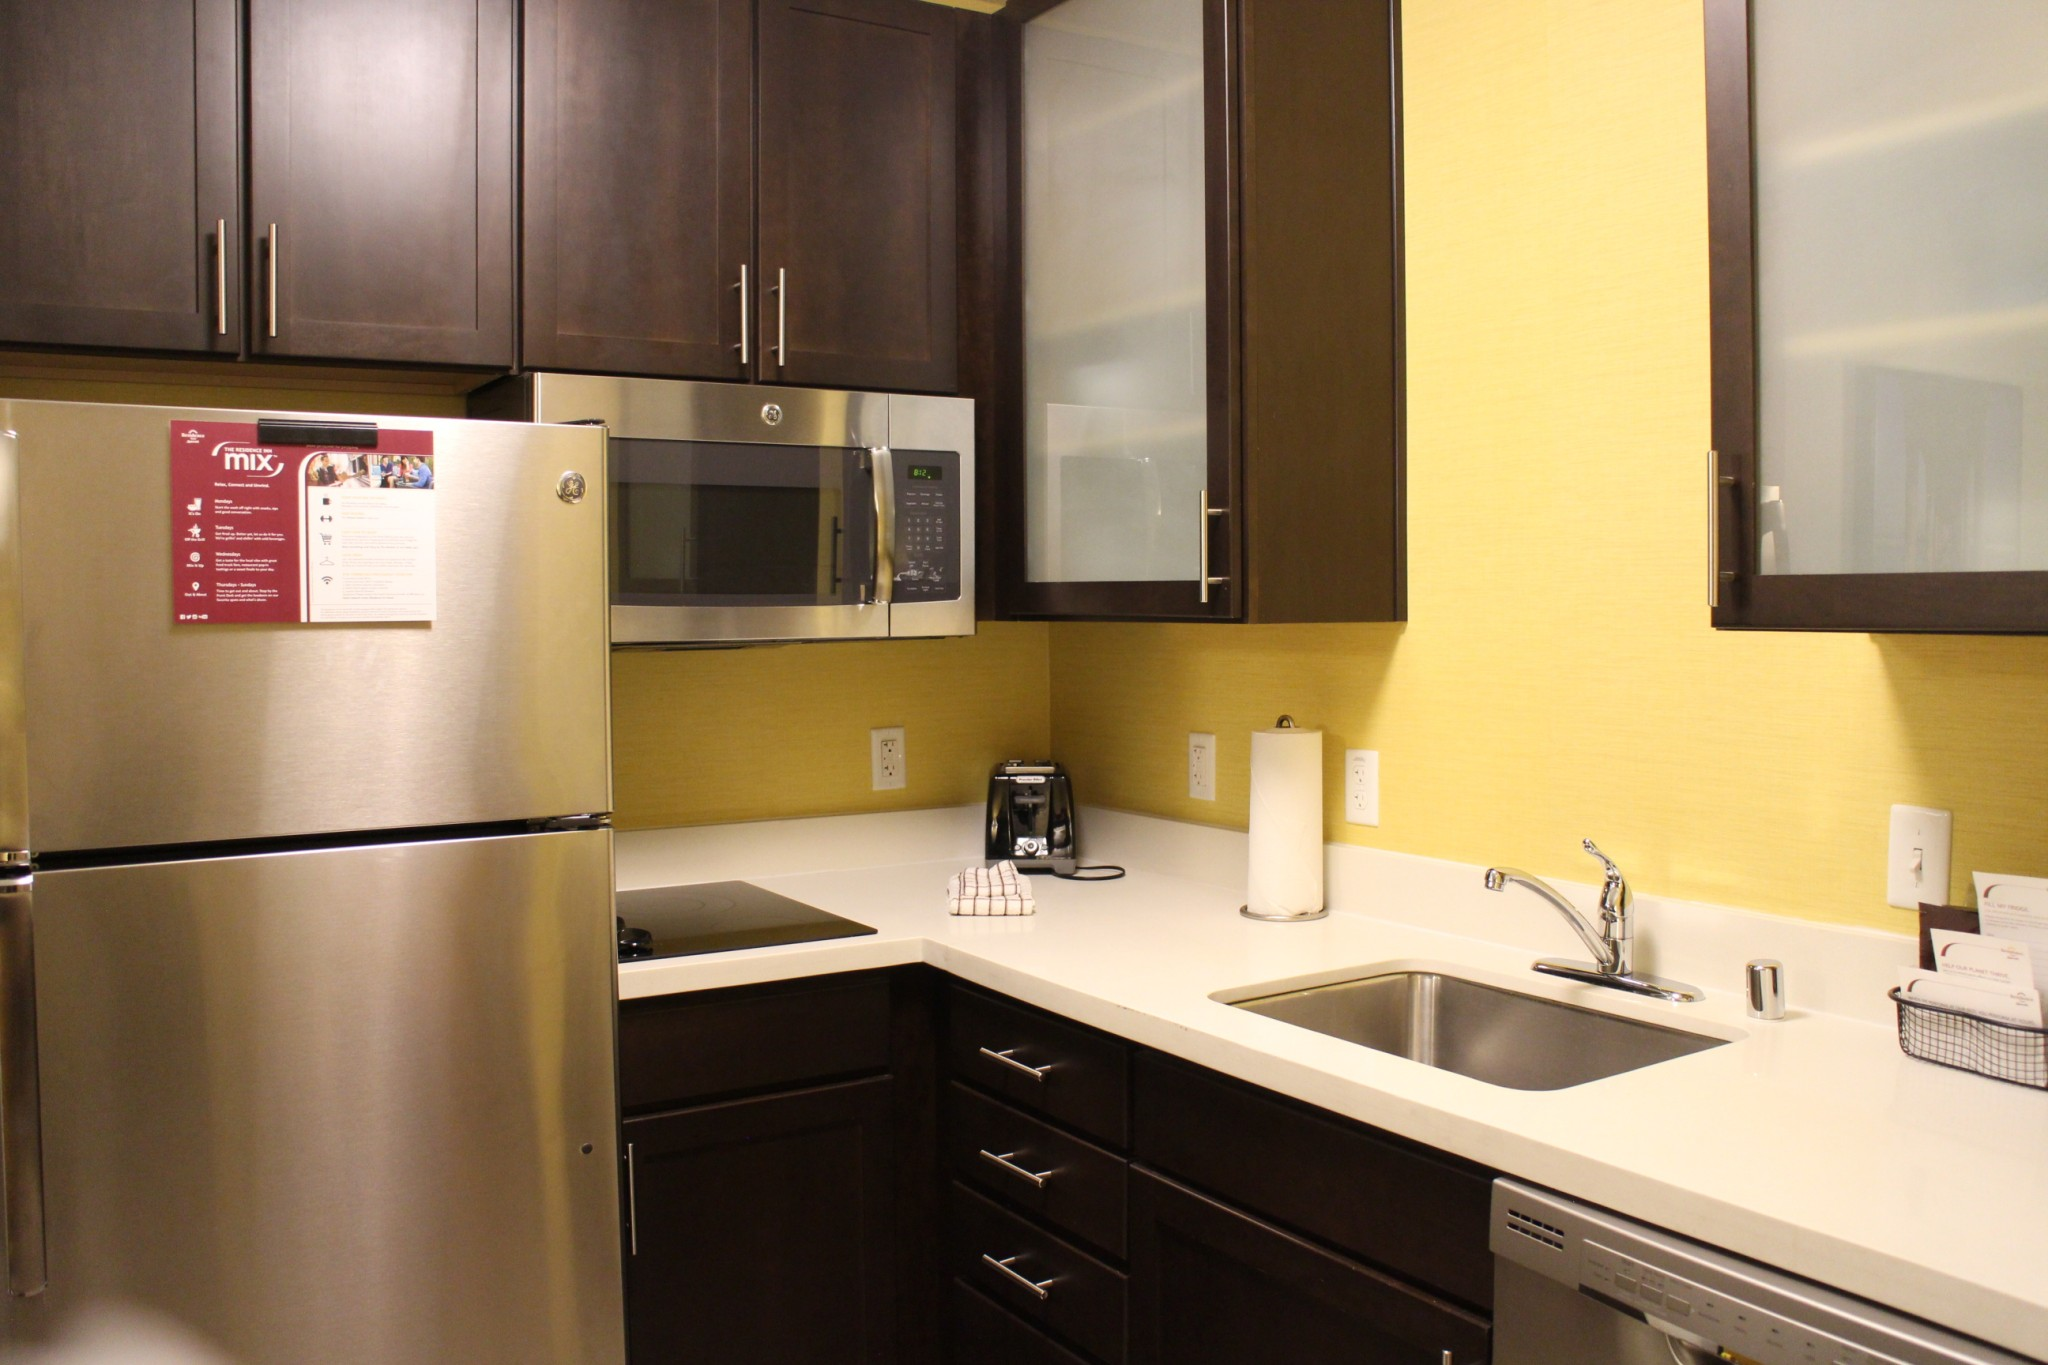 Residence Inn Redondo Beach kitchen 2